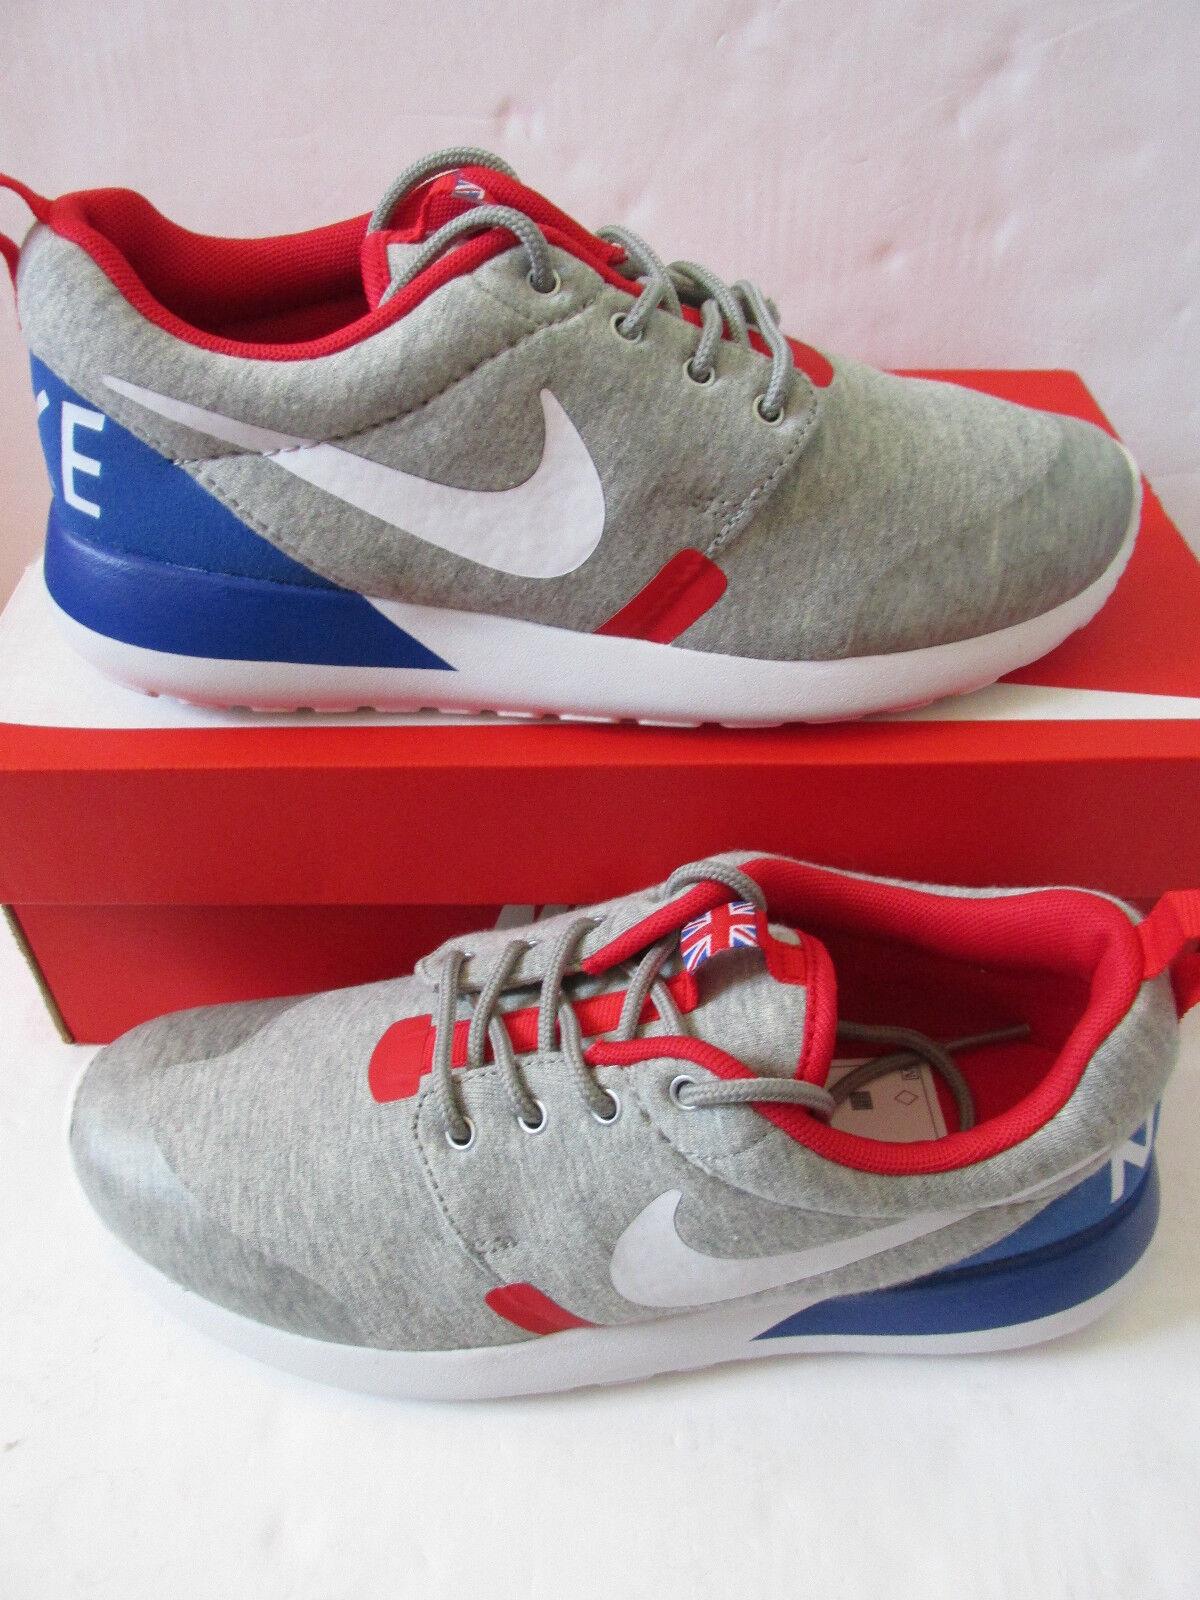 new product 57b27 02063 NIKE ROSHERUN QS Gs Scarpe da corsa 703935 002 Scarpe da tennis